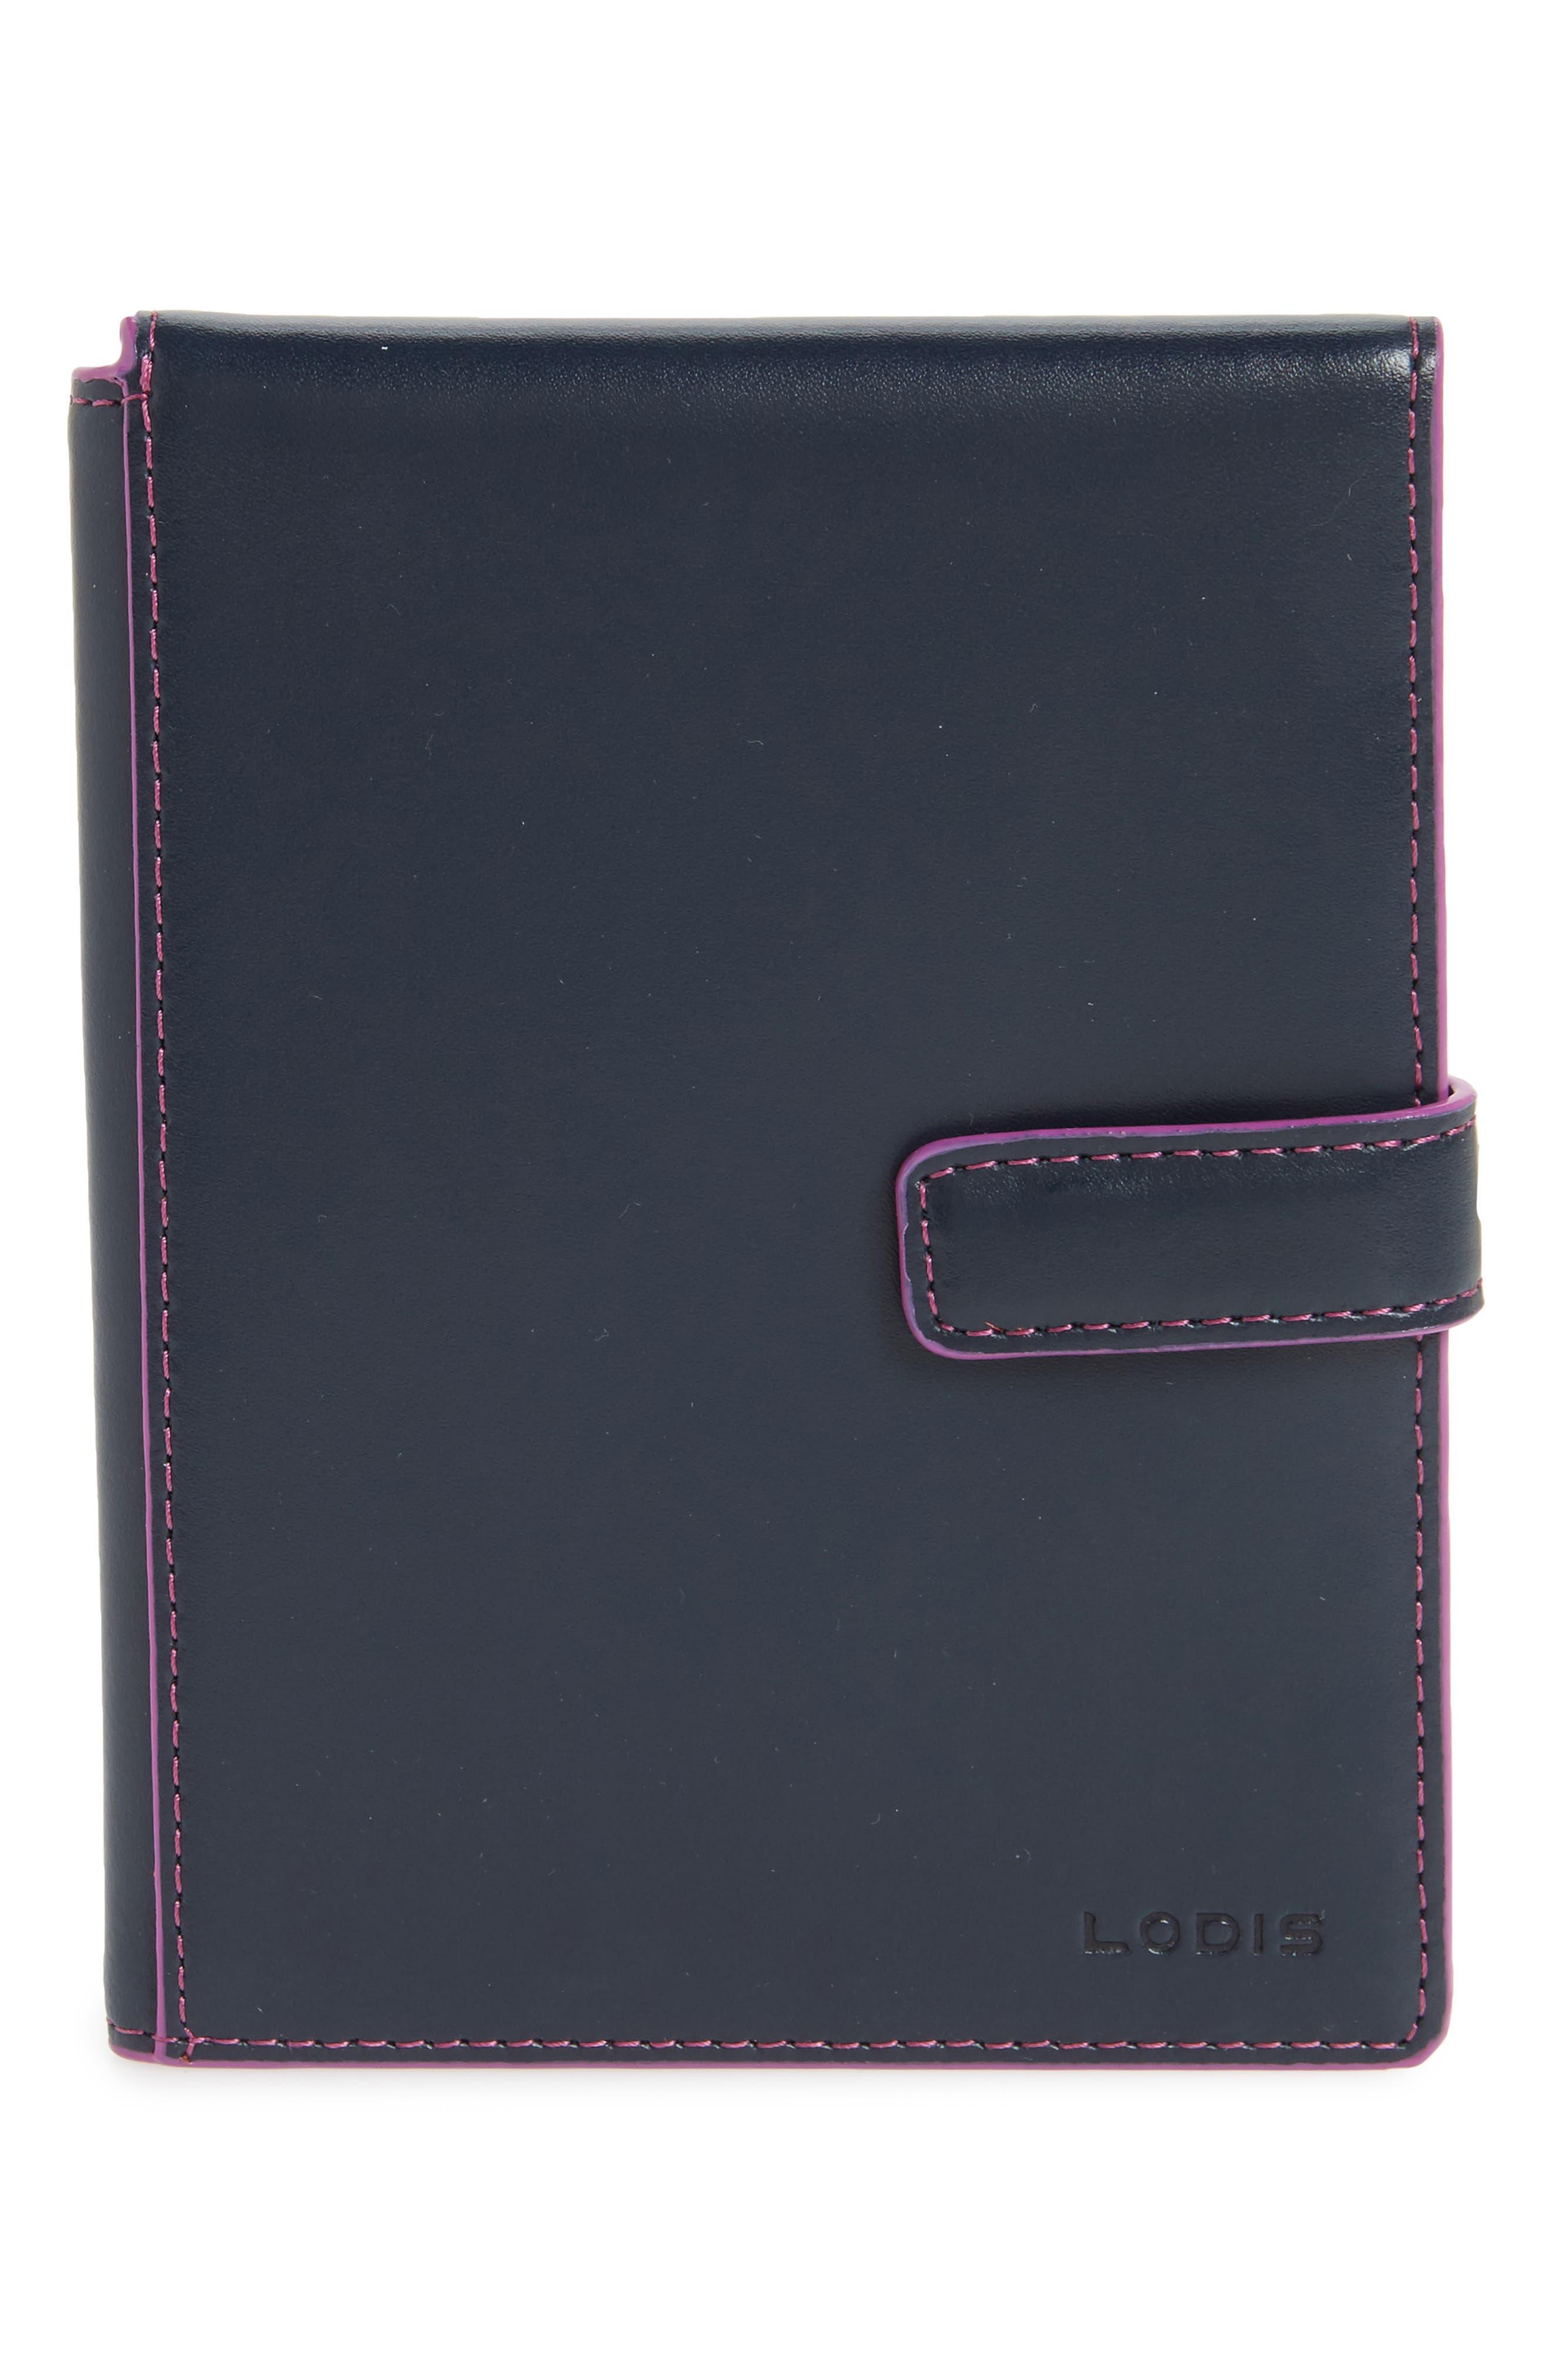 LODIS Audrey RFID Leather Passport Wallet (Nordstrom Exclusive)